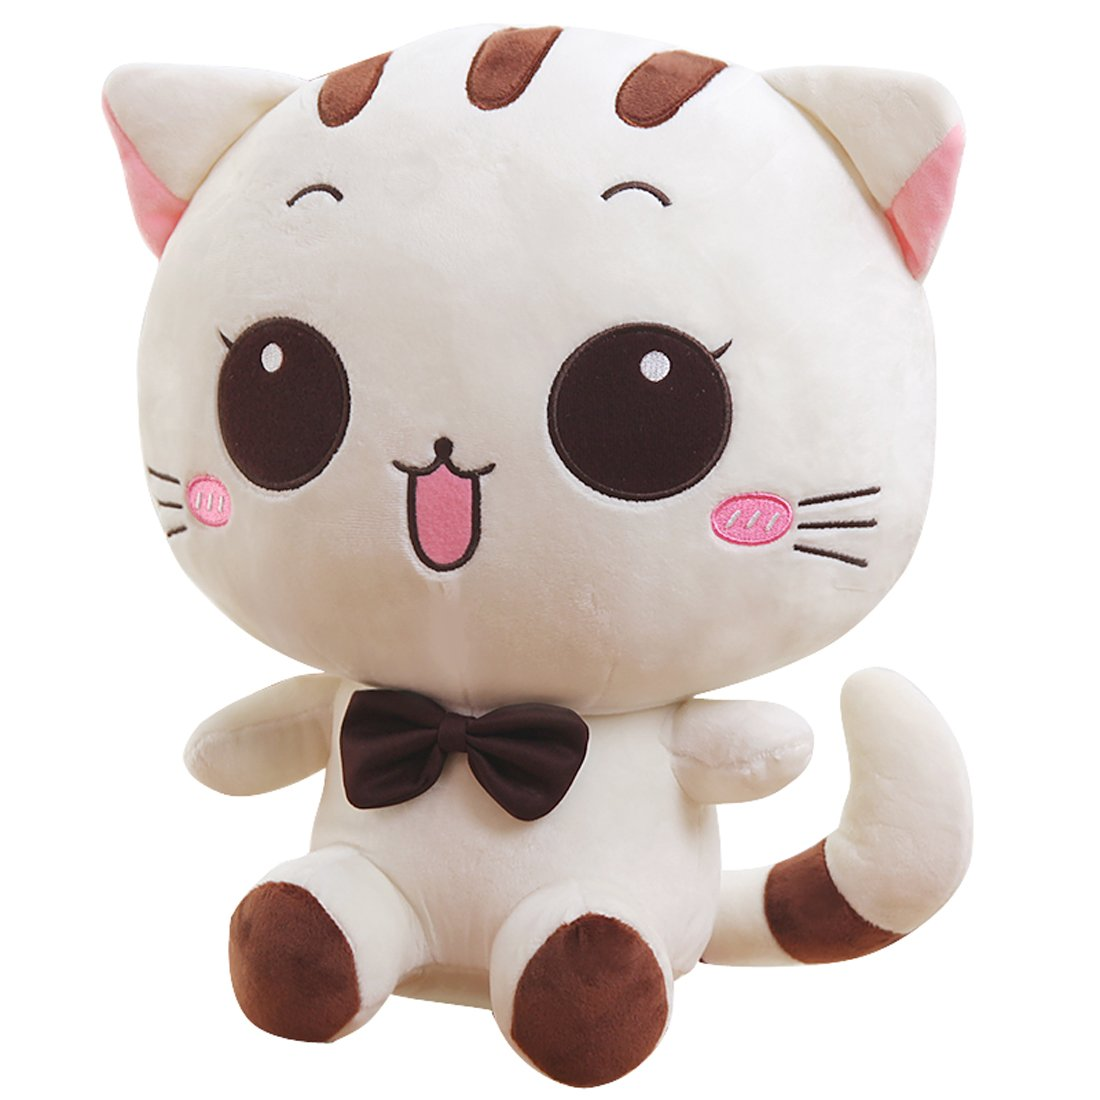 Peluche de peluche suave animales de peluche de juguete muñeca de marfil Cat 20